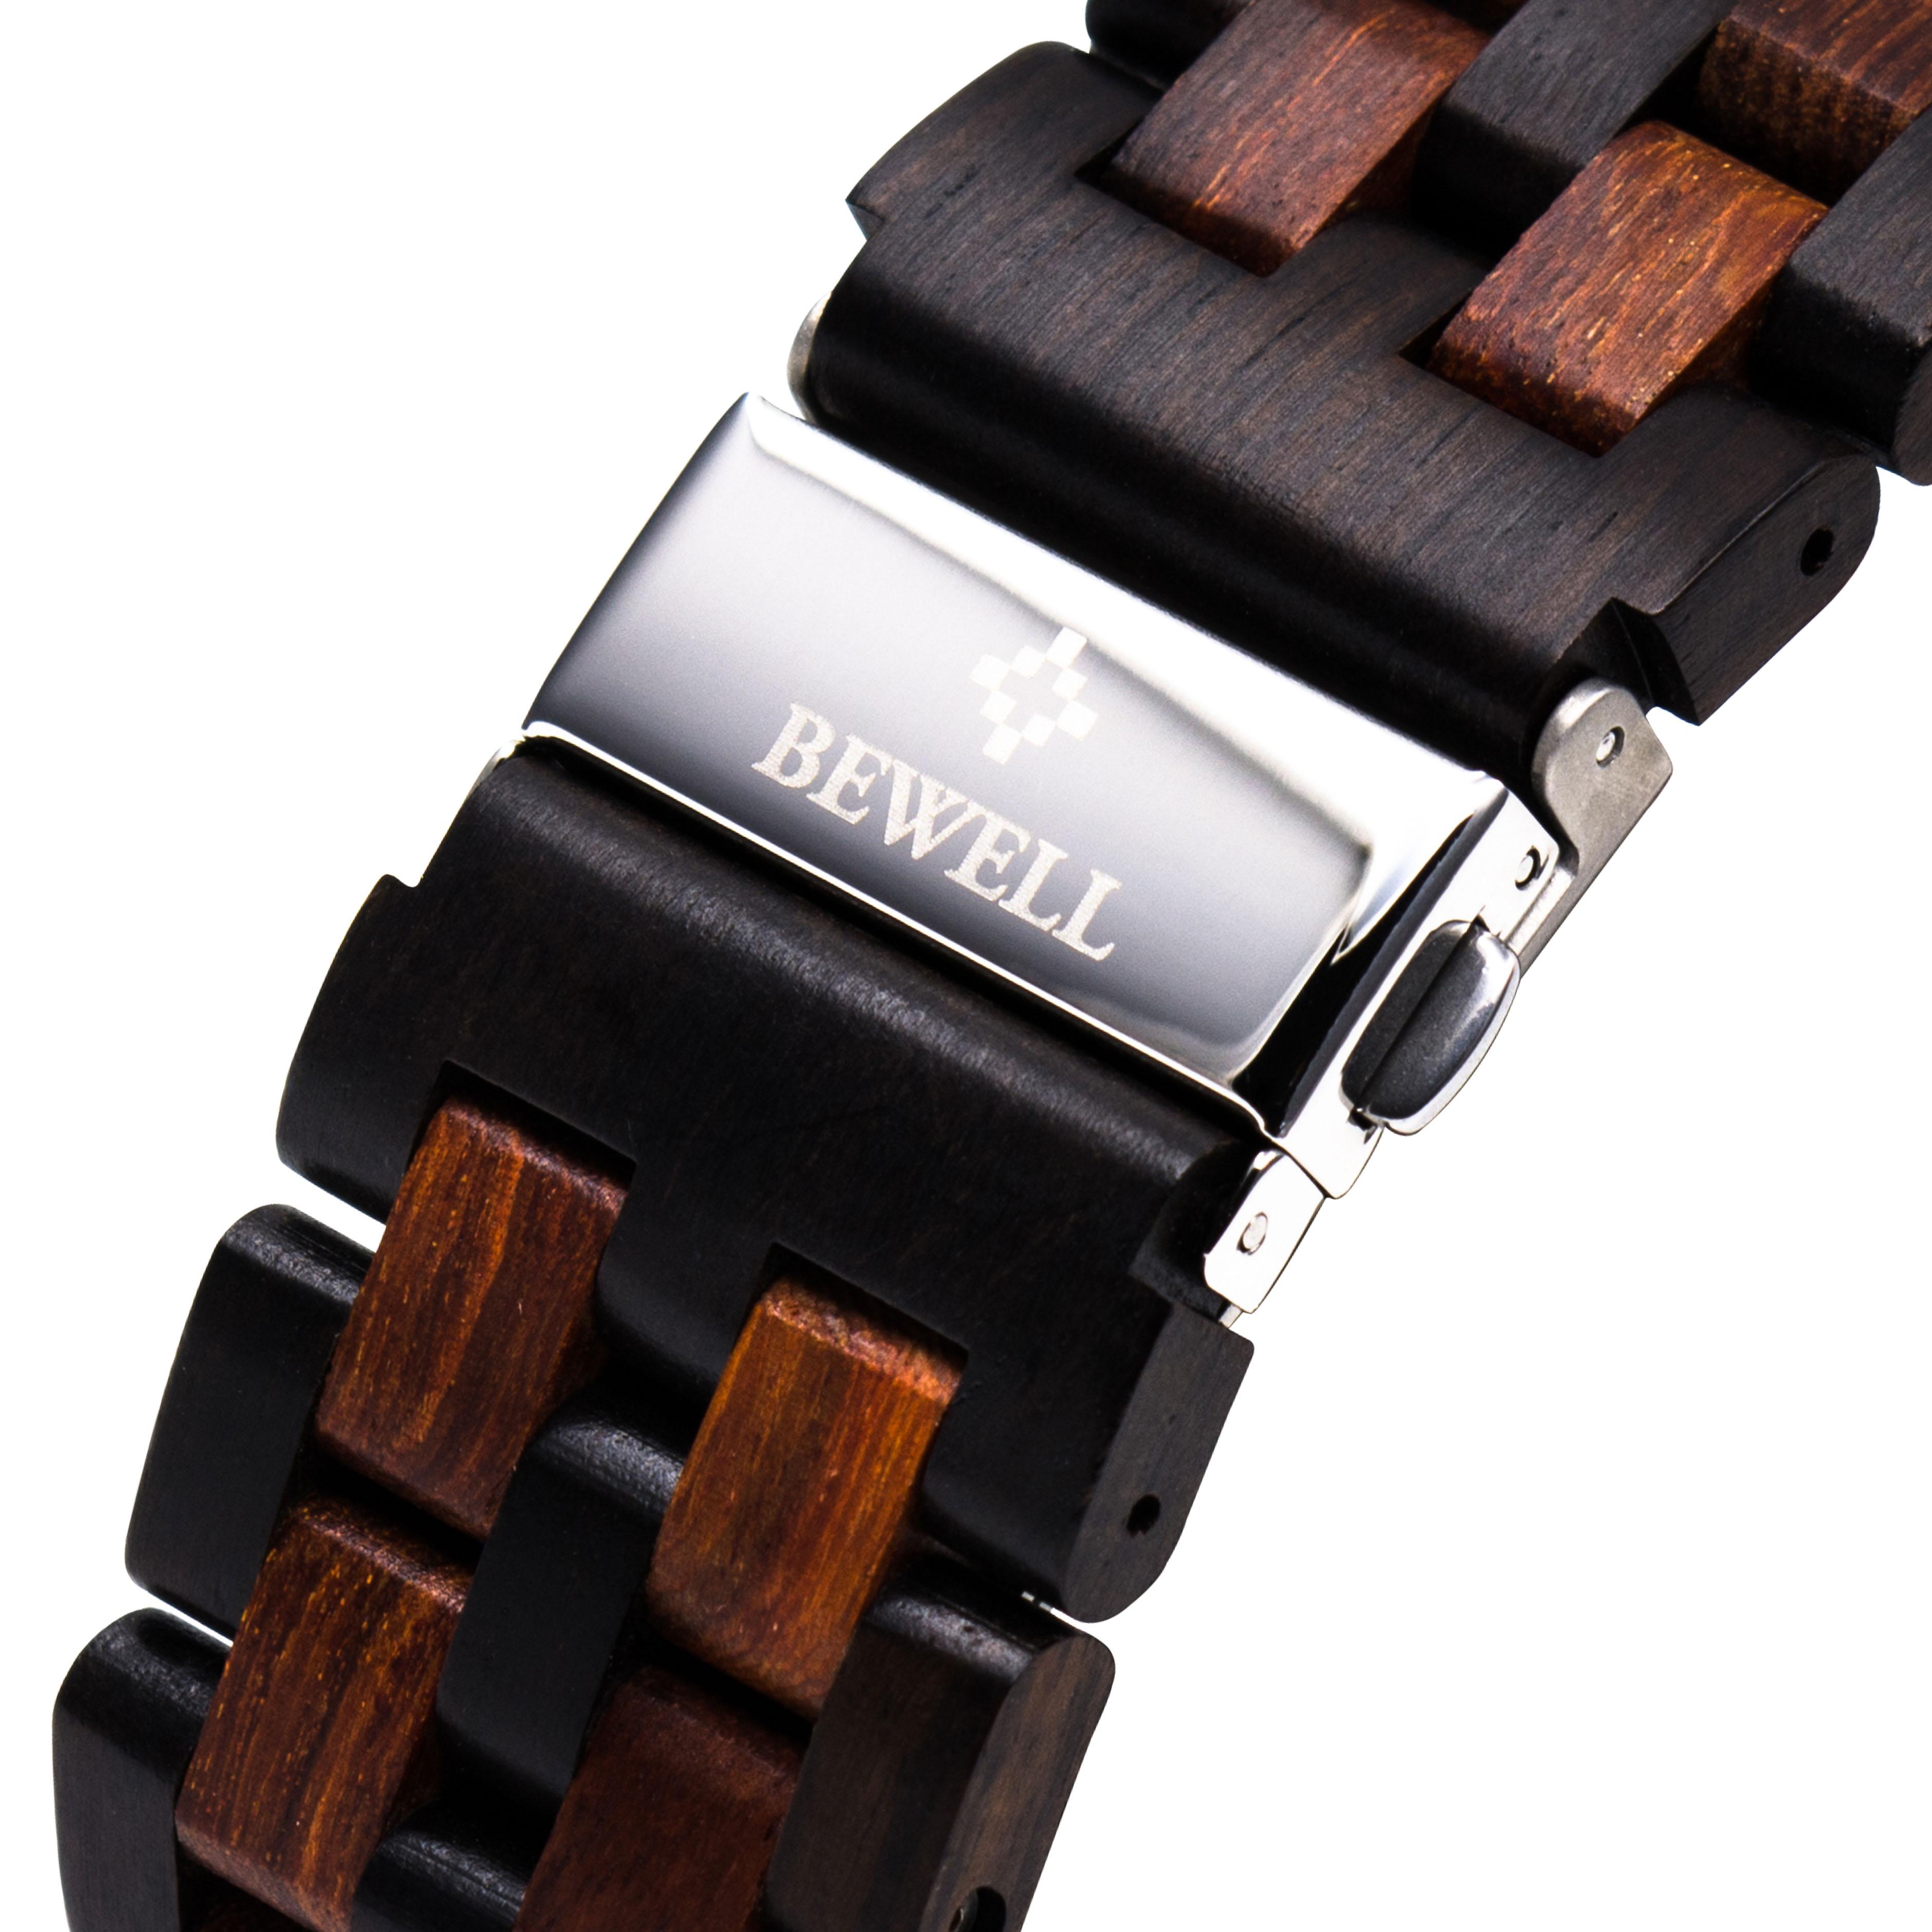 BEWELL Luxury Brand Men's Wood Quartz Wrist Watch Men Sport Waterproof Watch Man Chronograph Clock Relogio Masculino 109D enlarge